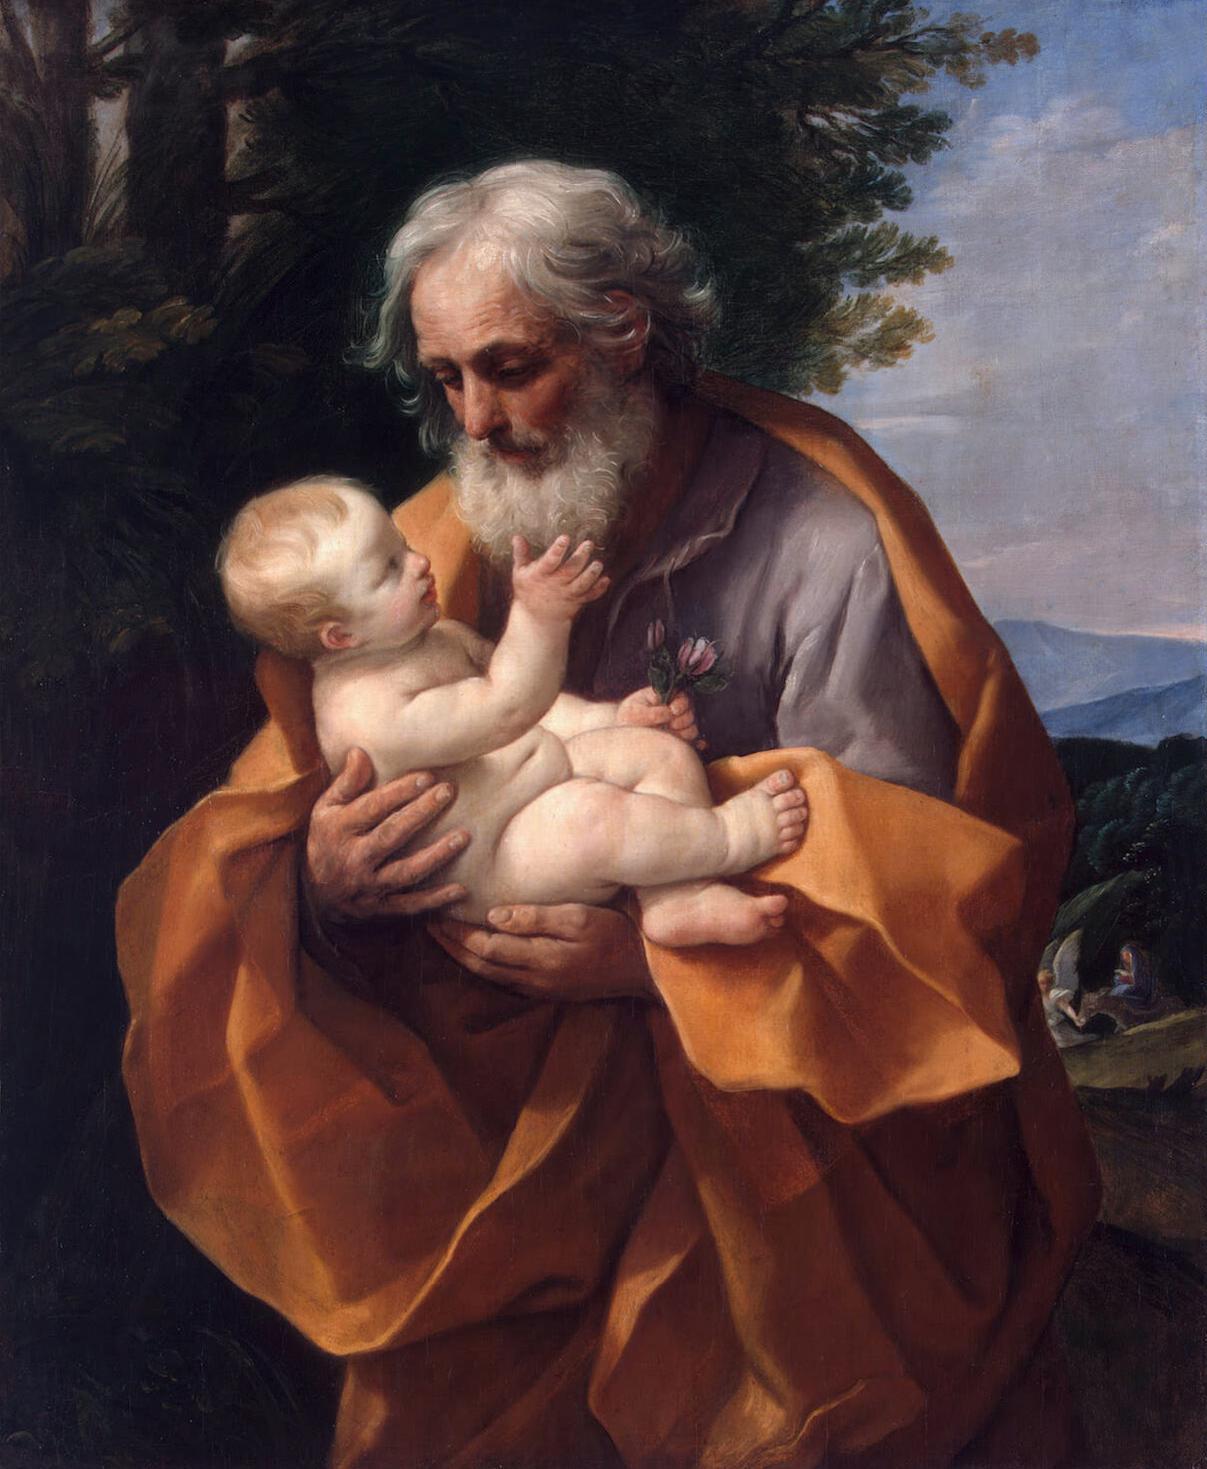 San Giuseppe Wikipedia